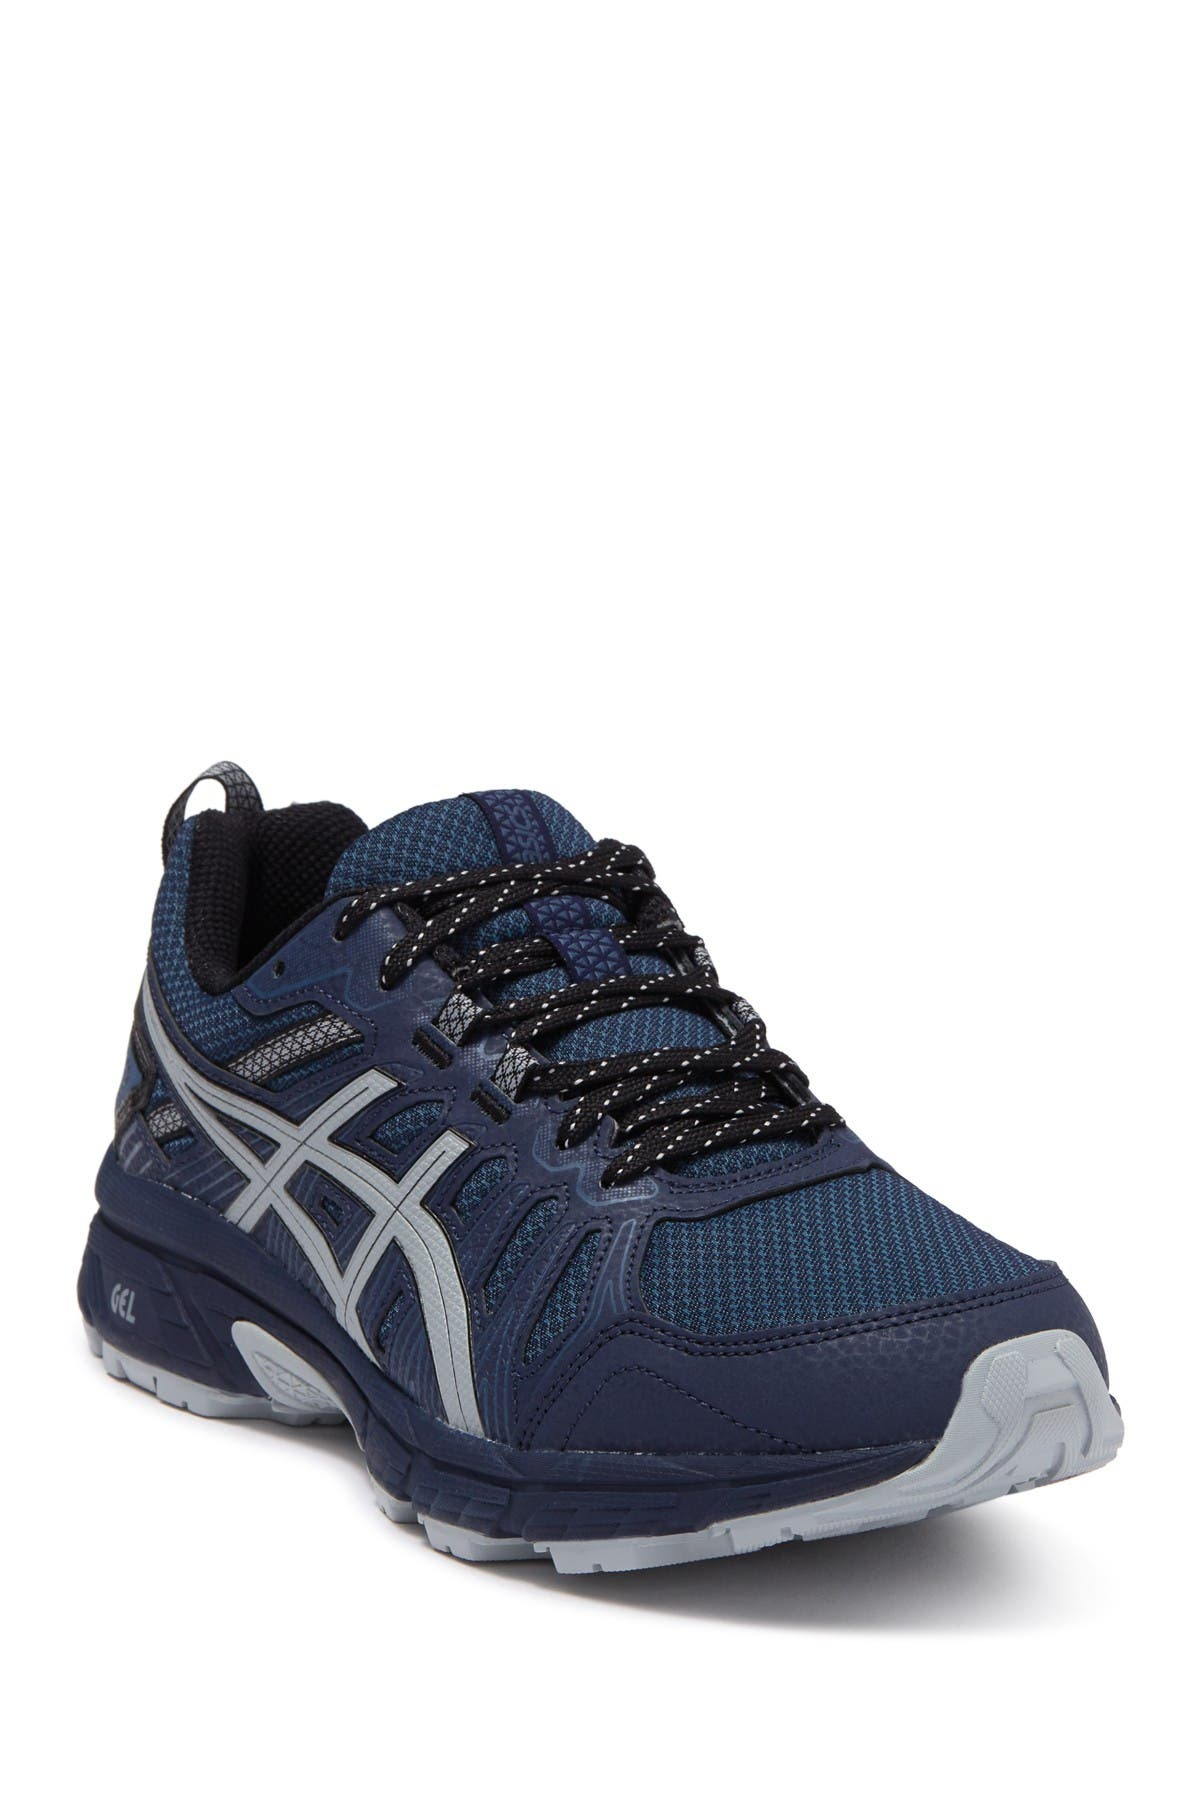 ASICS | GEL-Venture 7 Running Sneaker